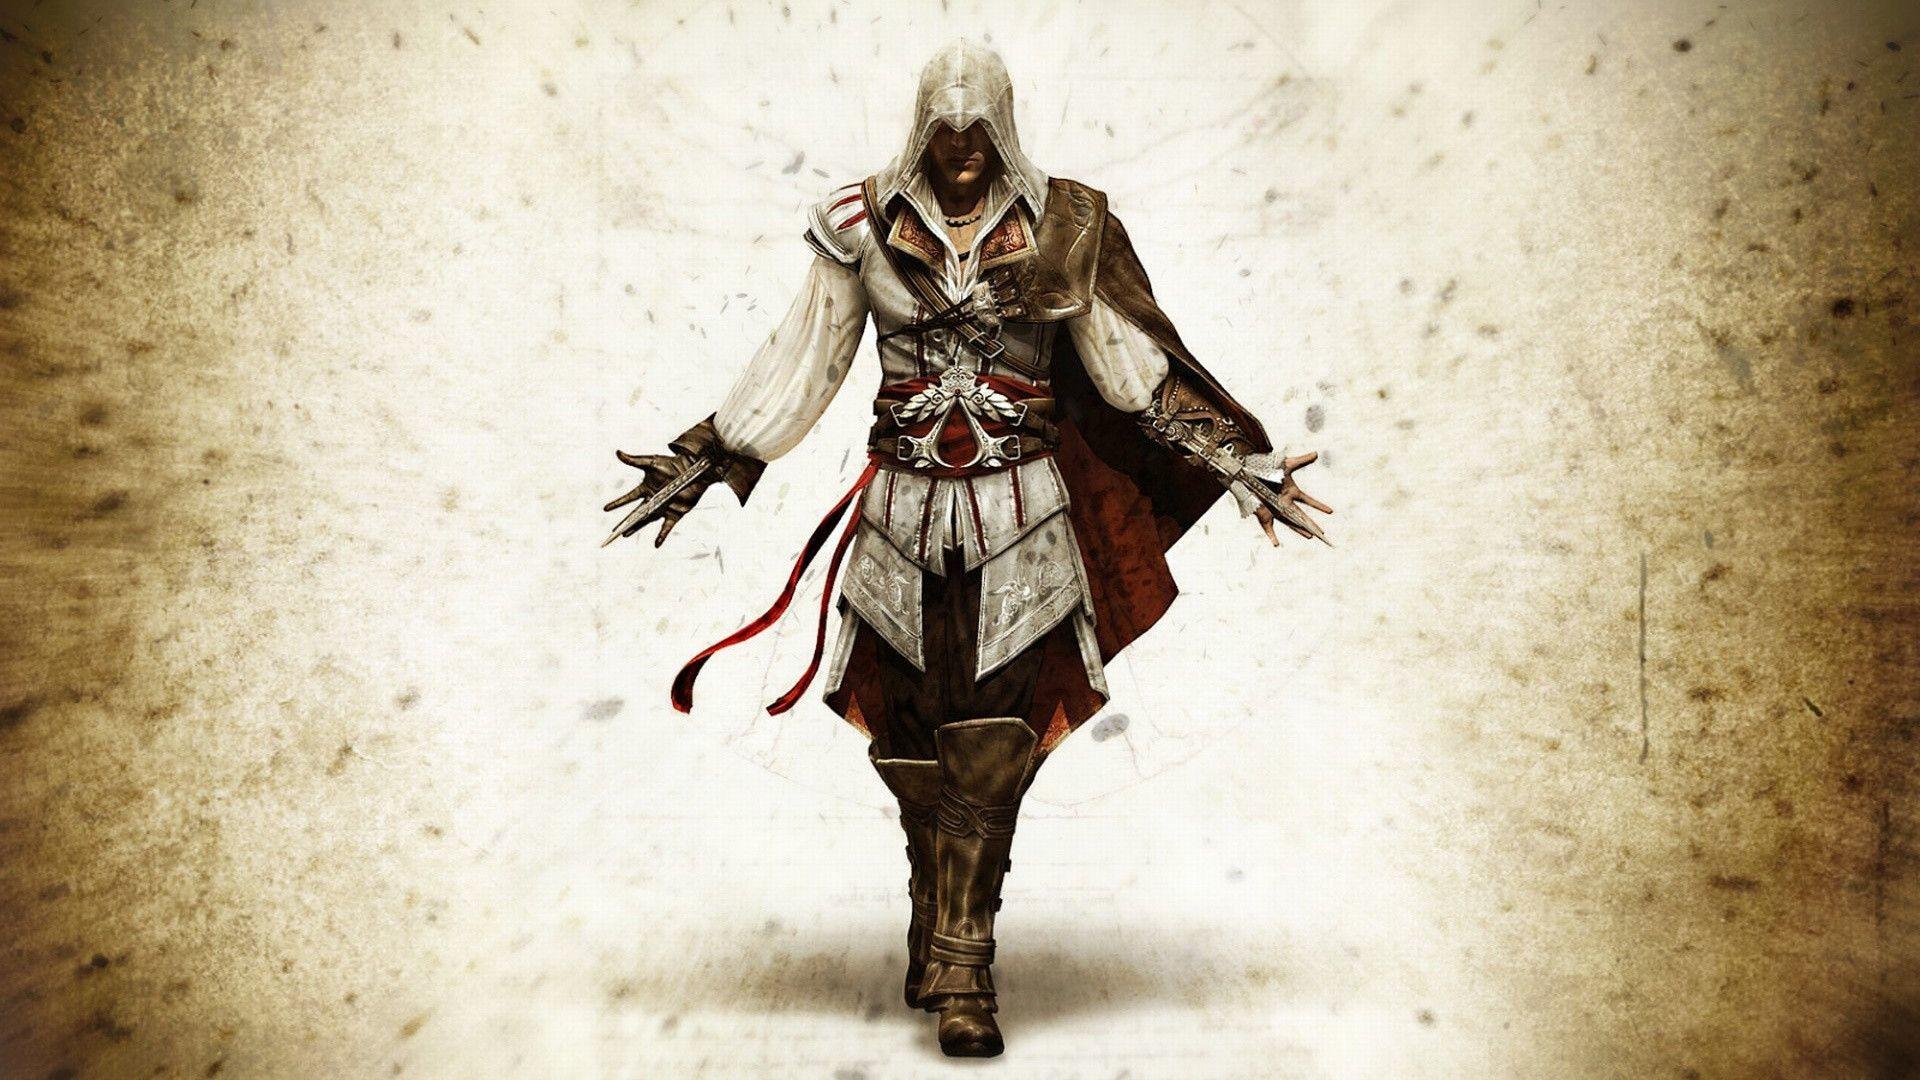 Assassins Creed Symbol Wallpapers Wallpaper Assassin's Creed Wallpaper  Wallpapers)